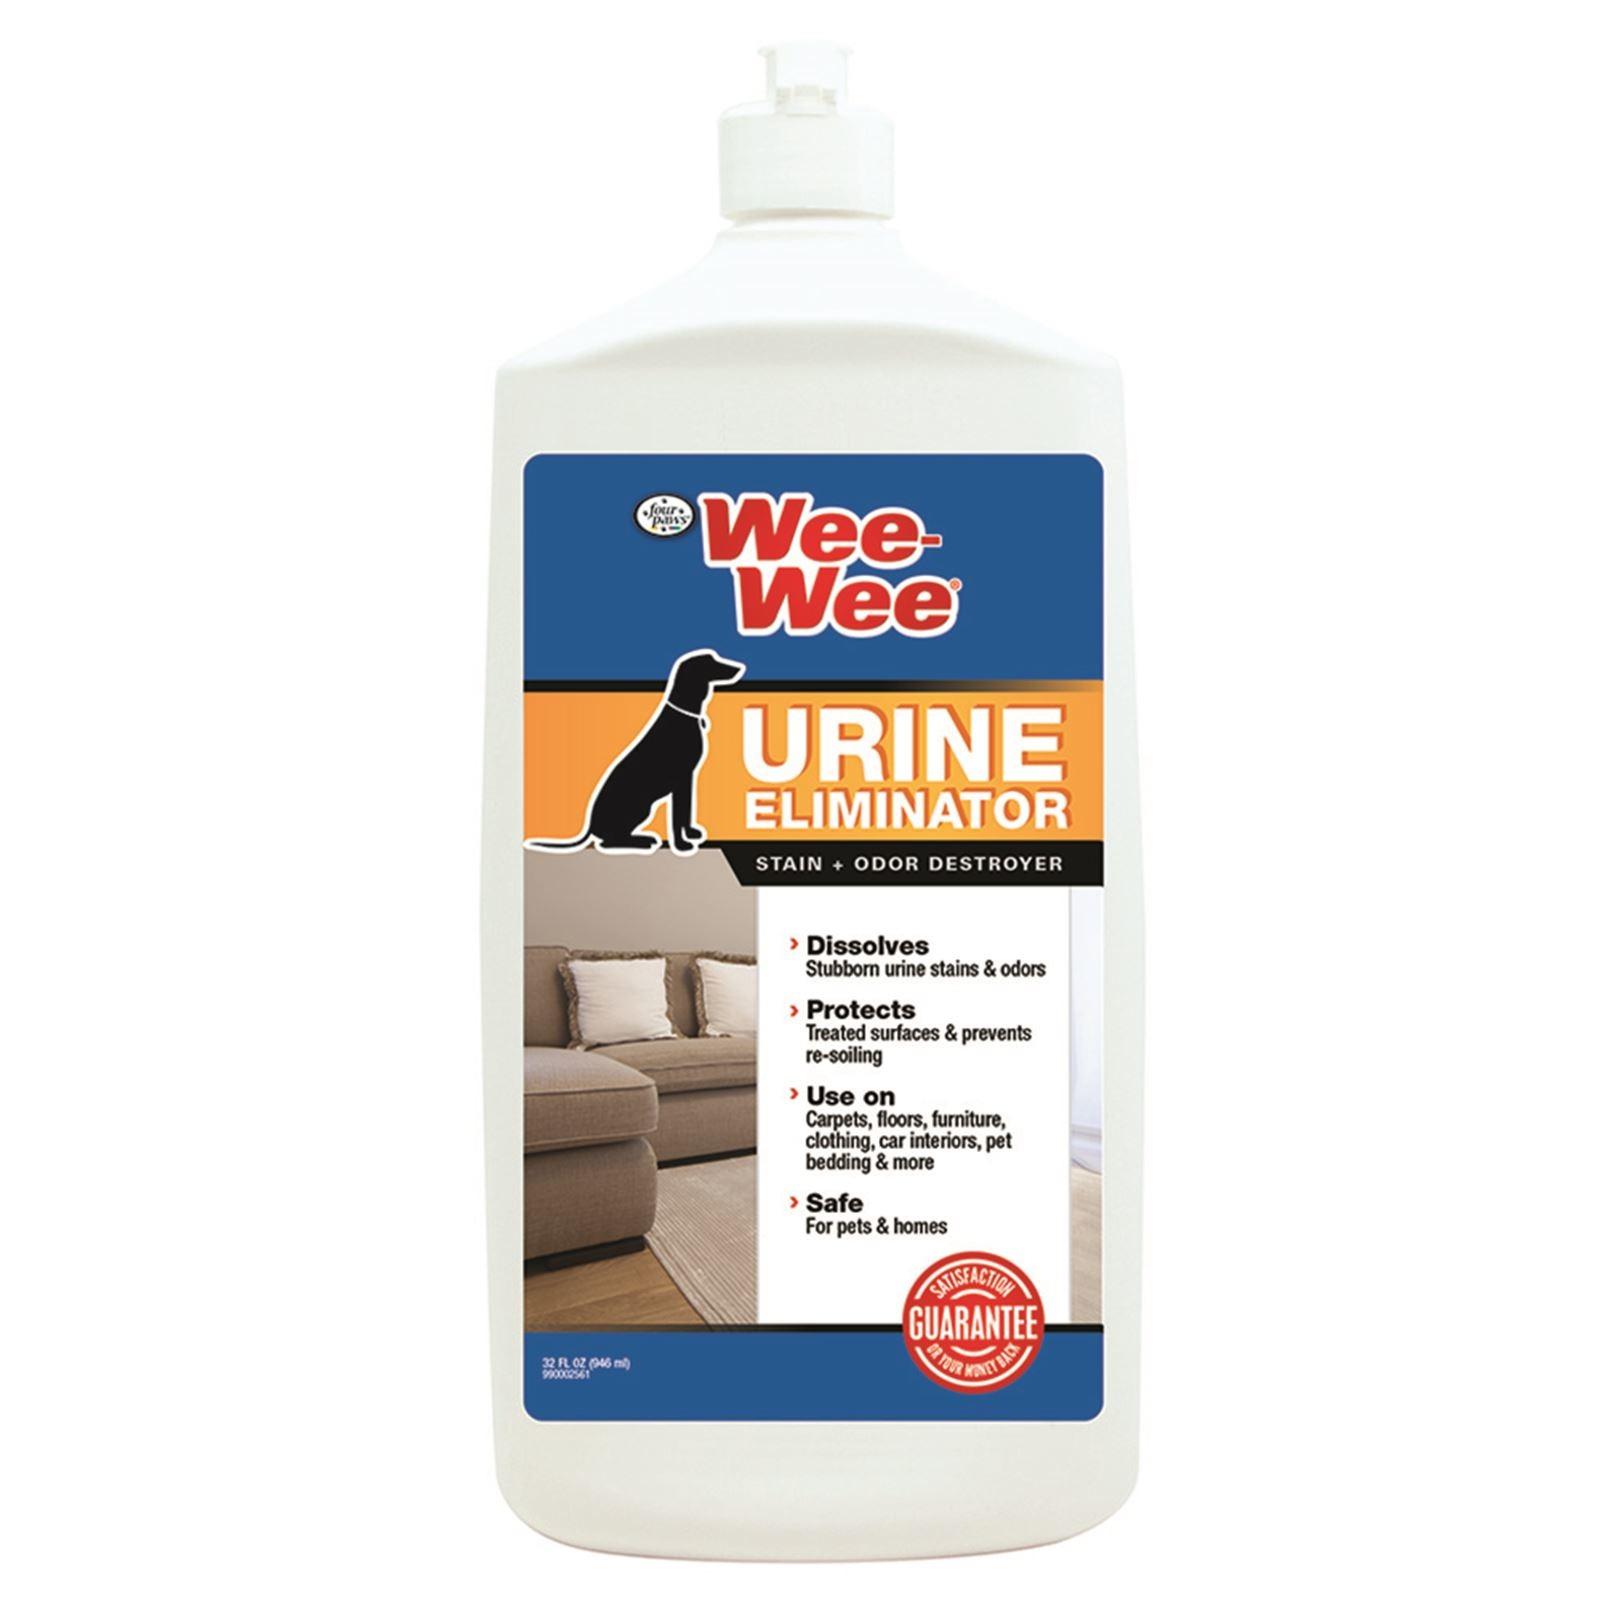 Four Paws Urine Eliminator Stain & Odor Destroyer